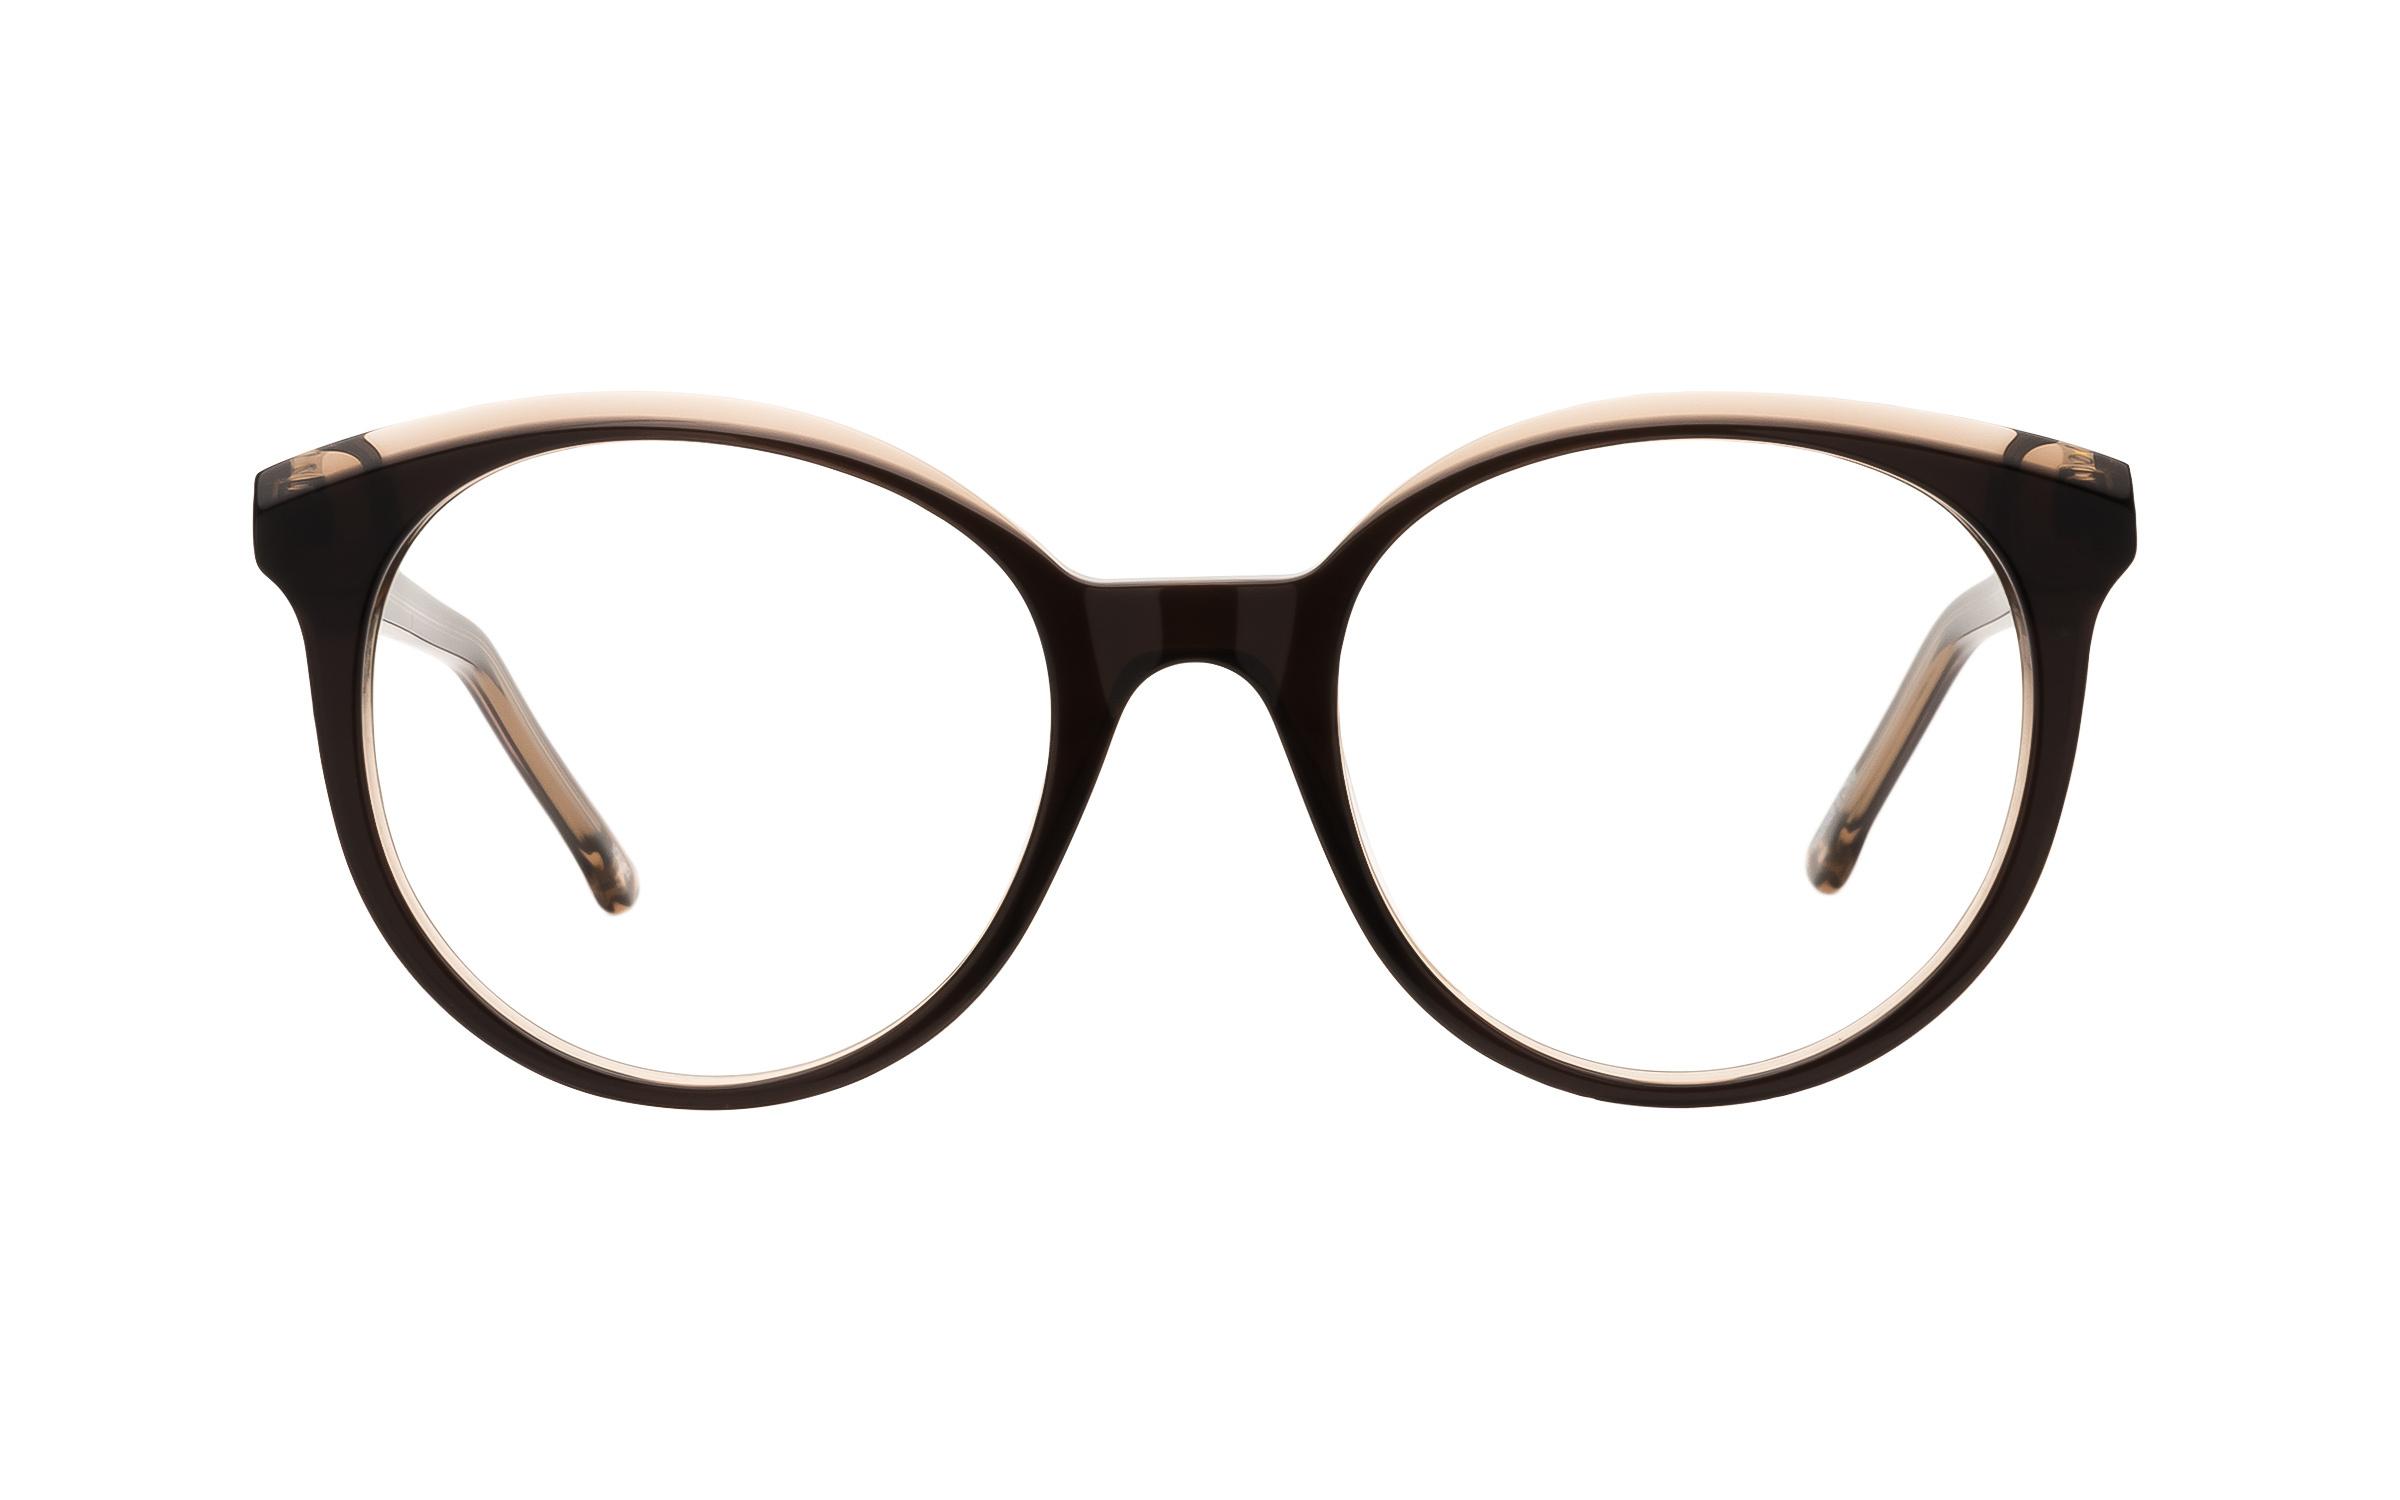 Derek Cardigan Glasses Oversized Black/Grey Online Coastal